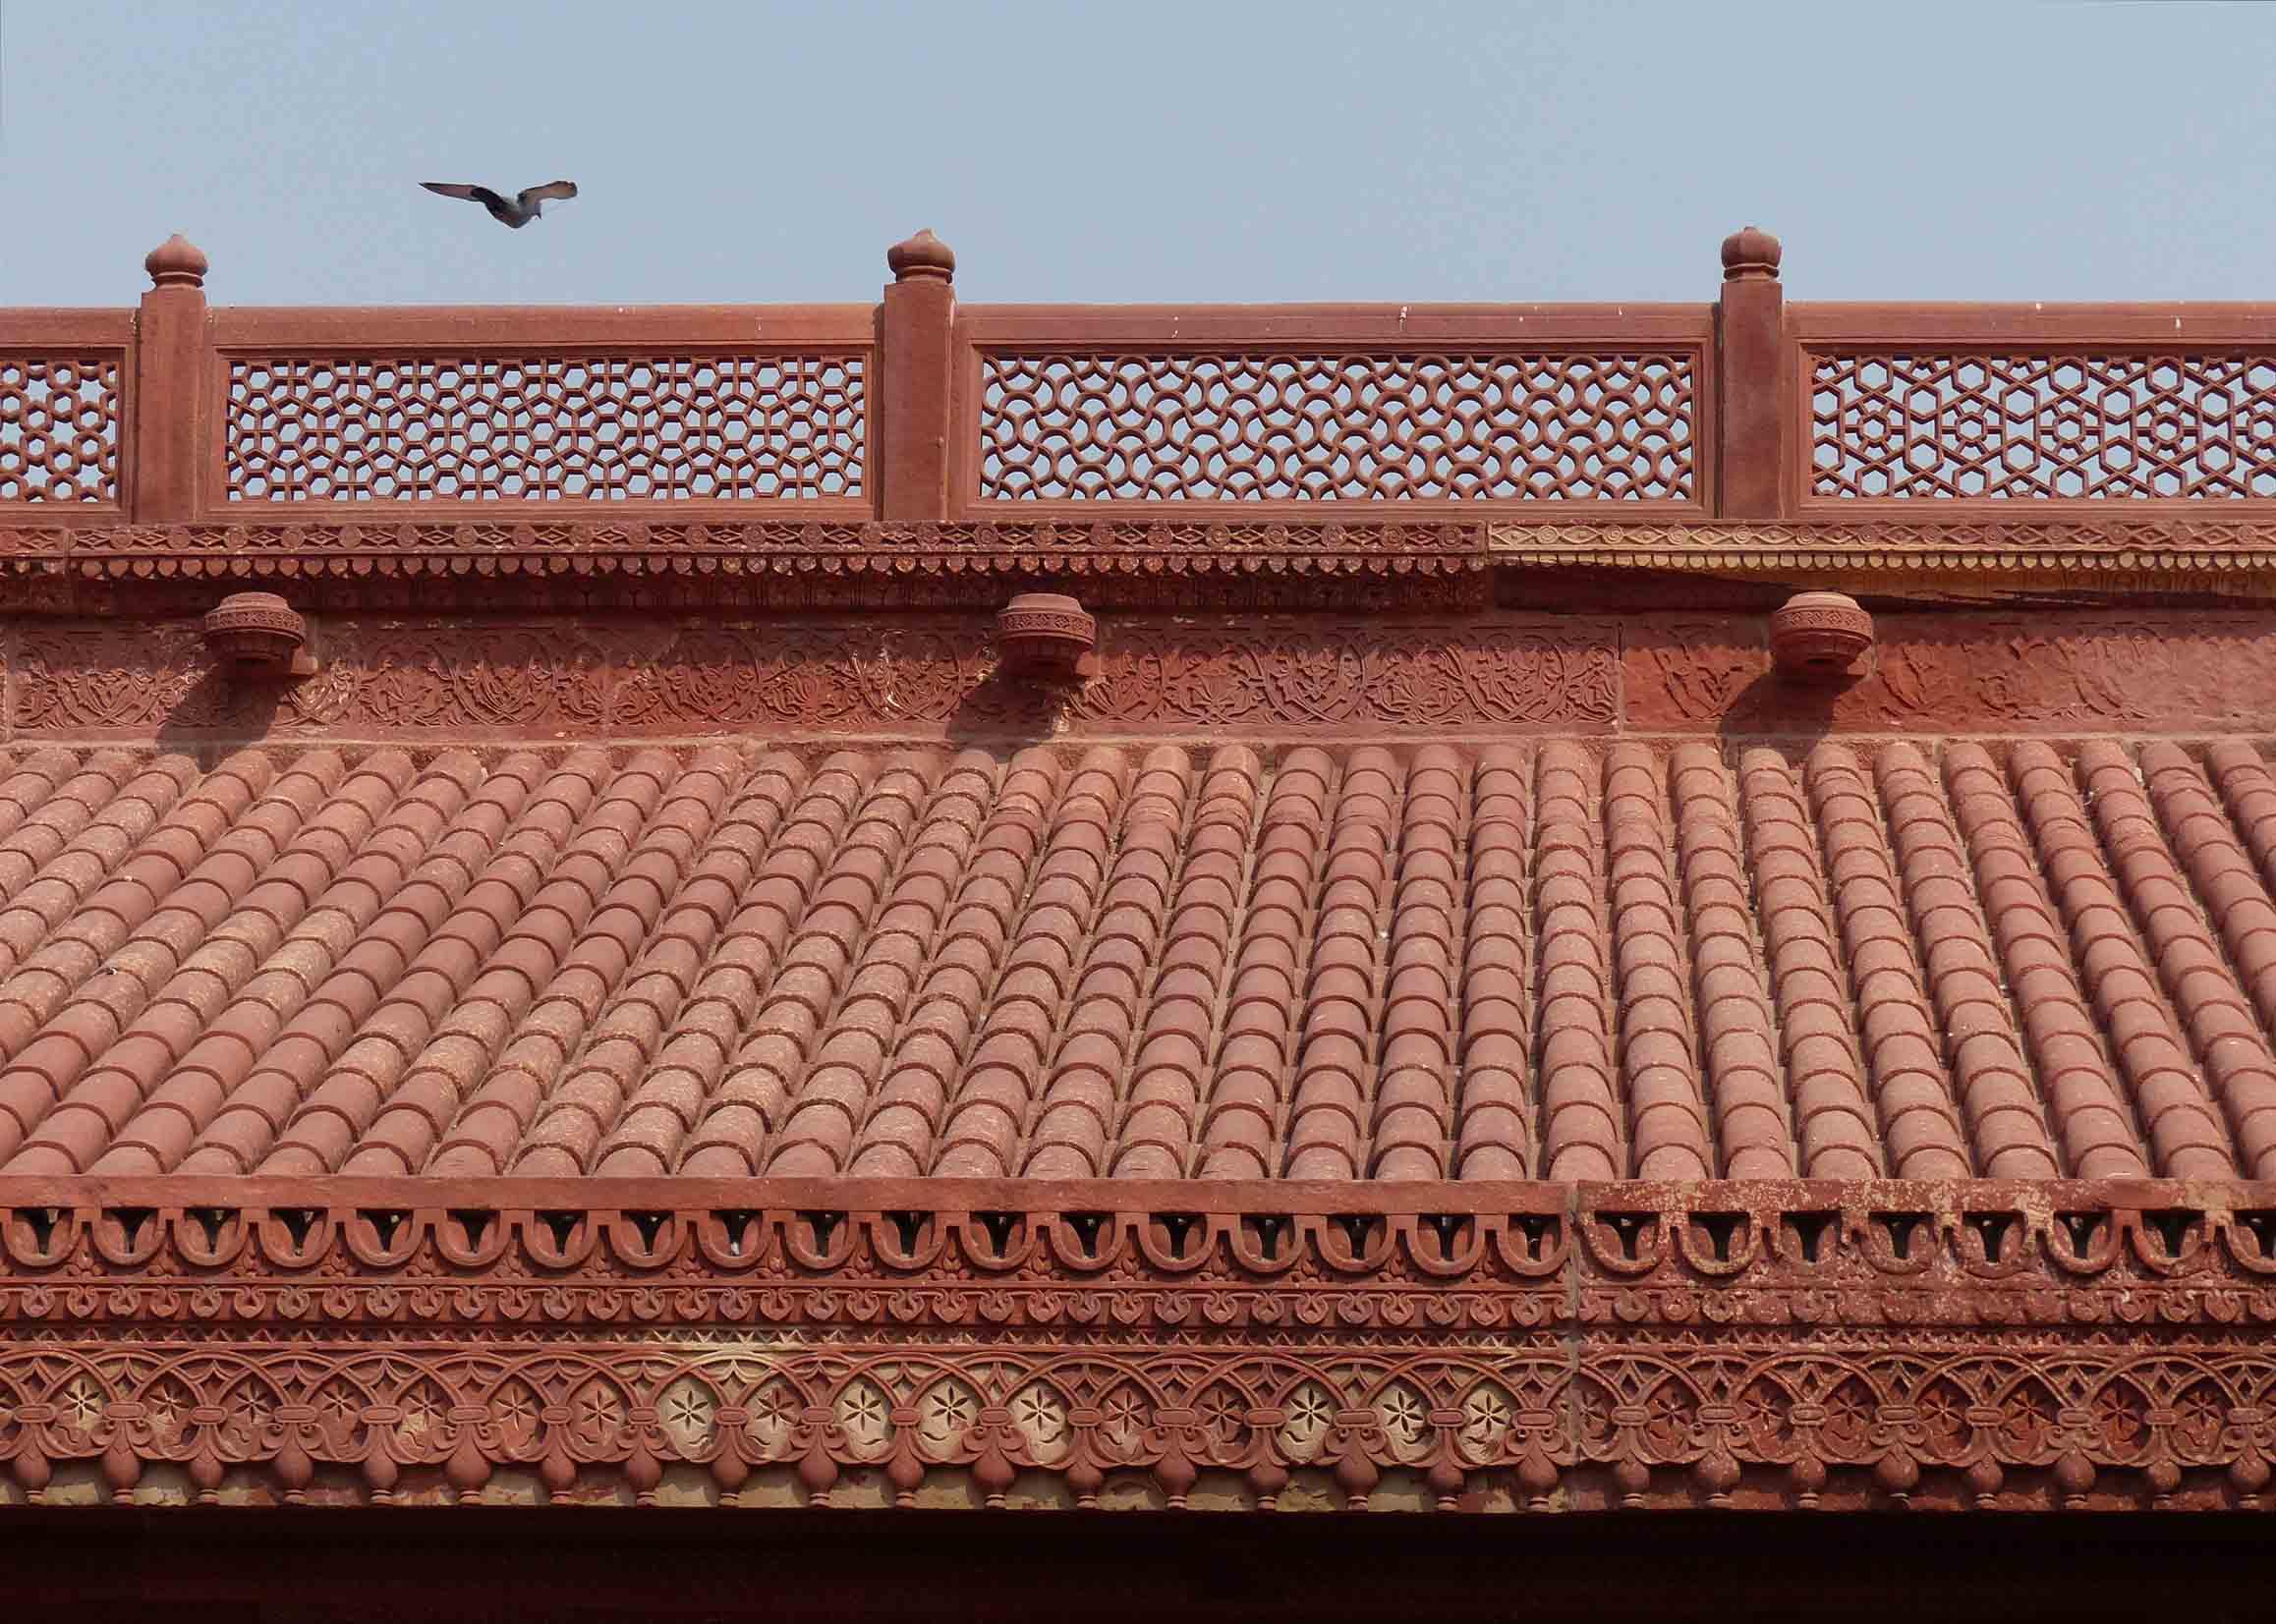 Ornate red sandstone roof